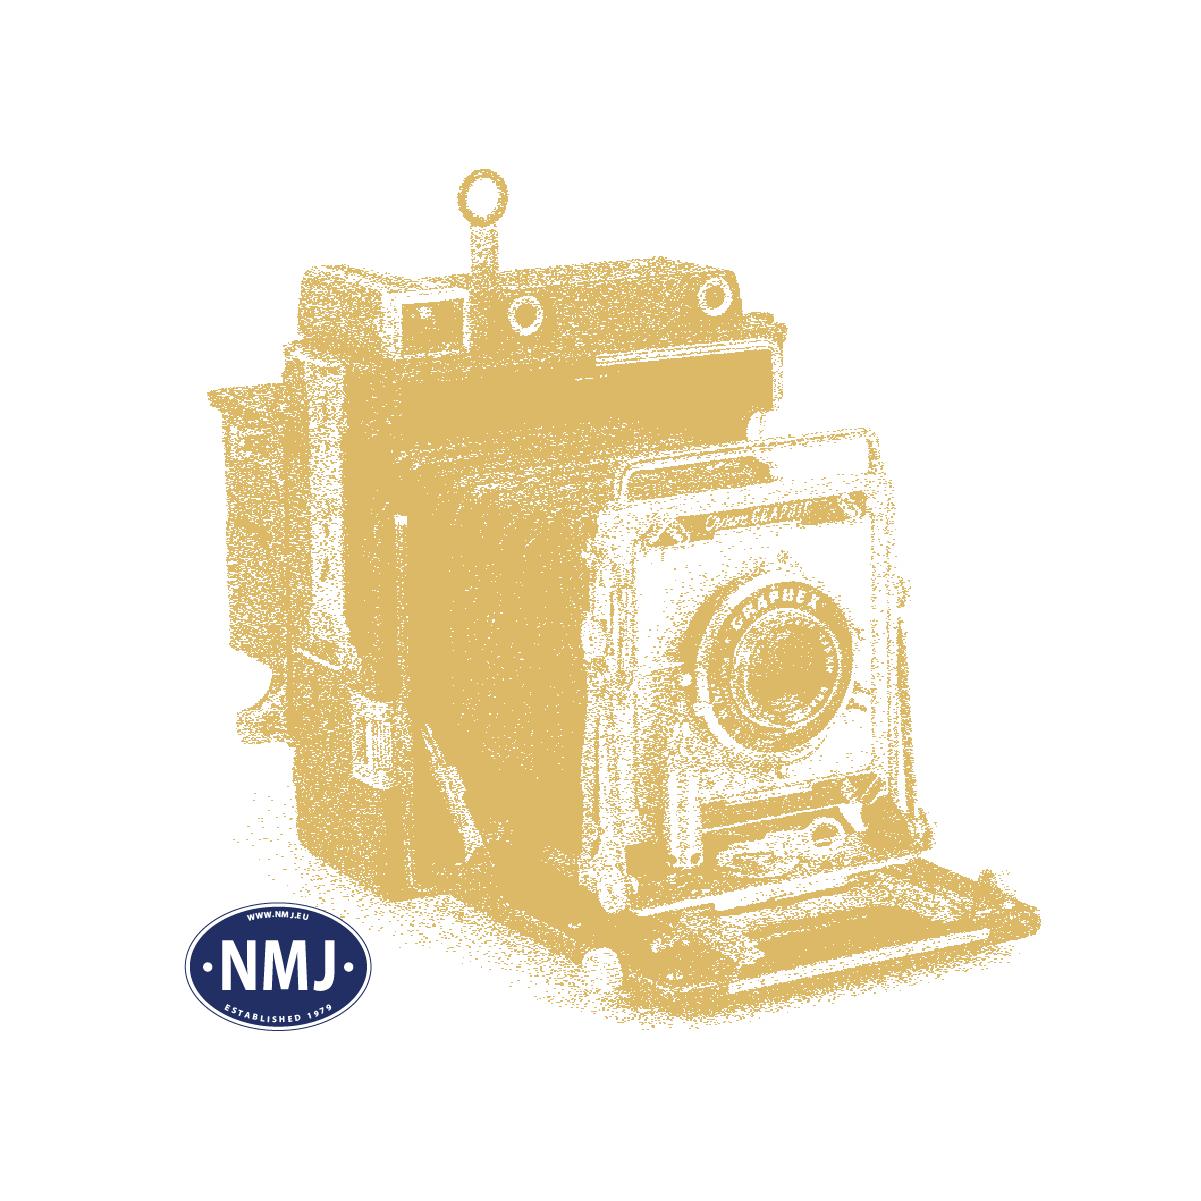 NMJT106.301 - NMJ Topline B3 25540 2.Kl Personenwagen der NSB, rot/schwarz